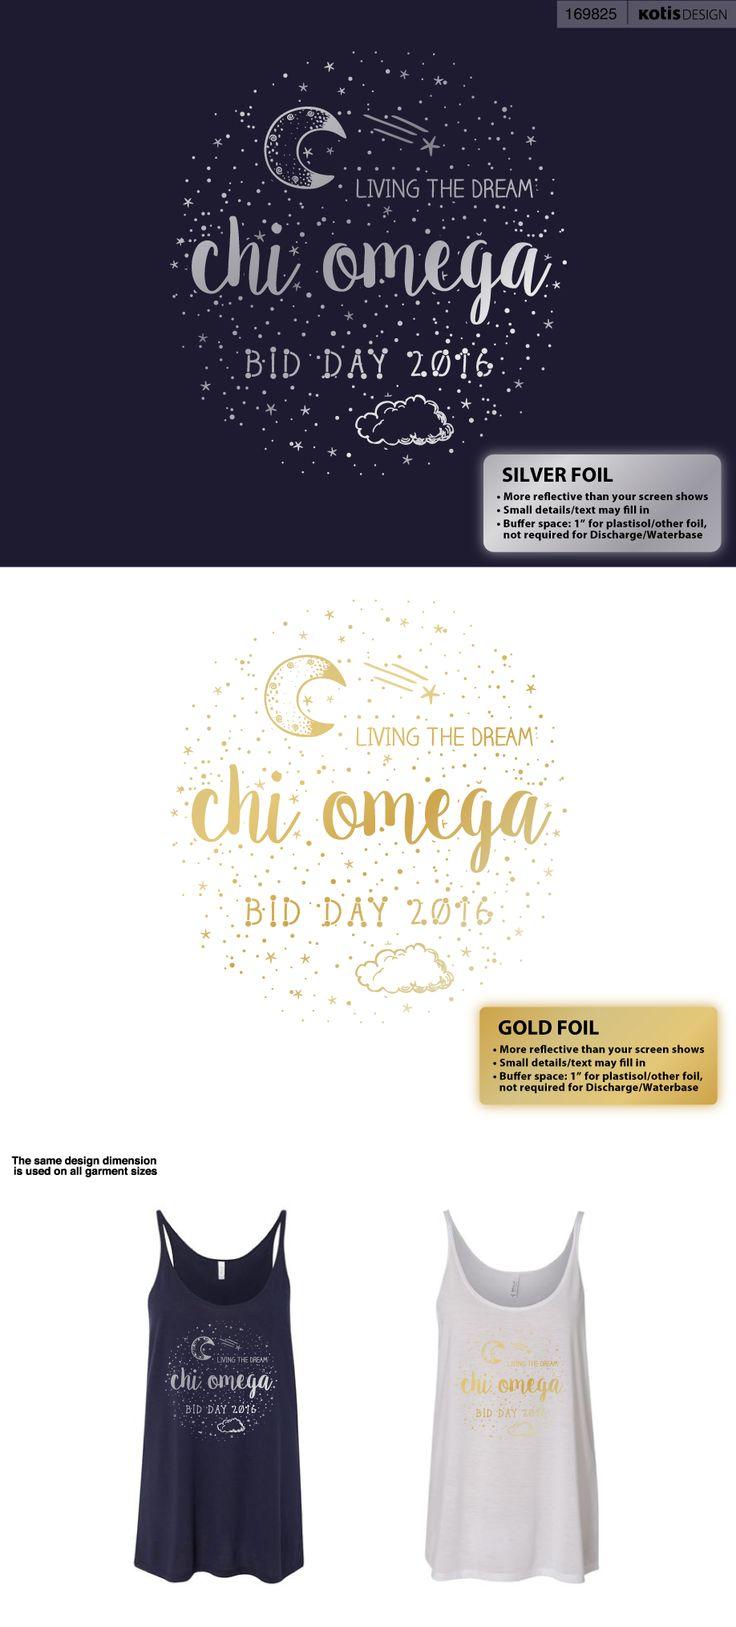 169825 - UO ChiO | Bid Day '16 - View Proof - Kotis Design